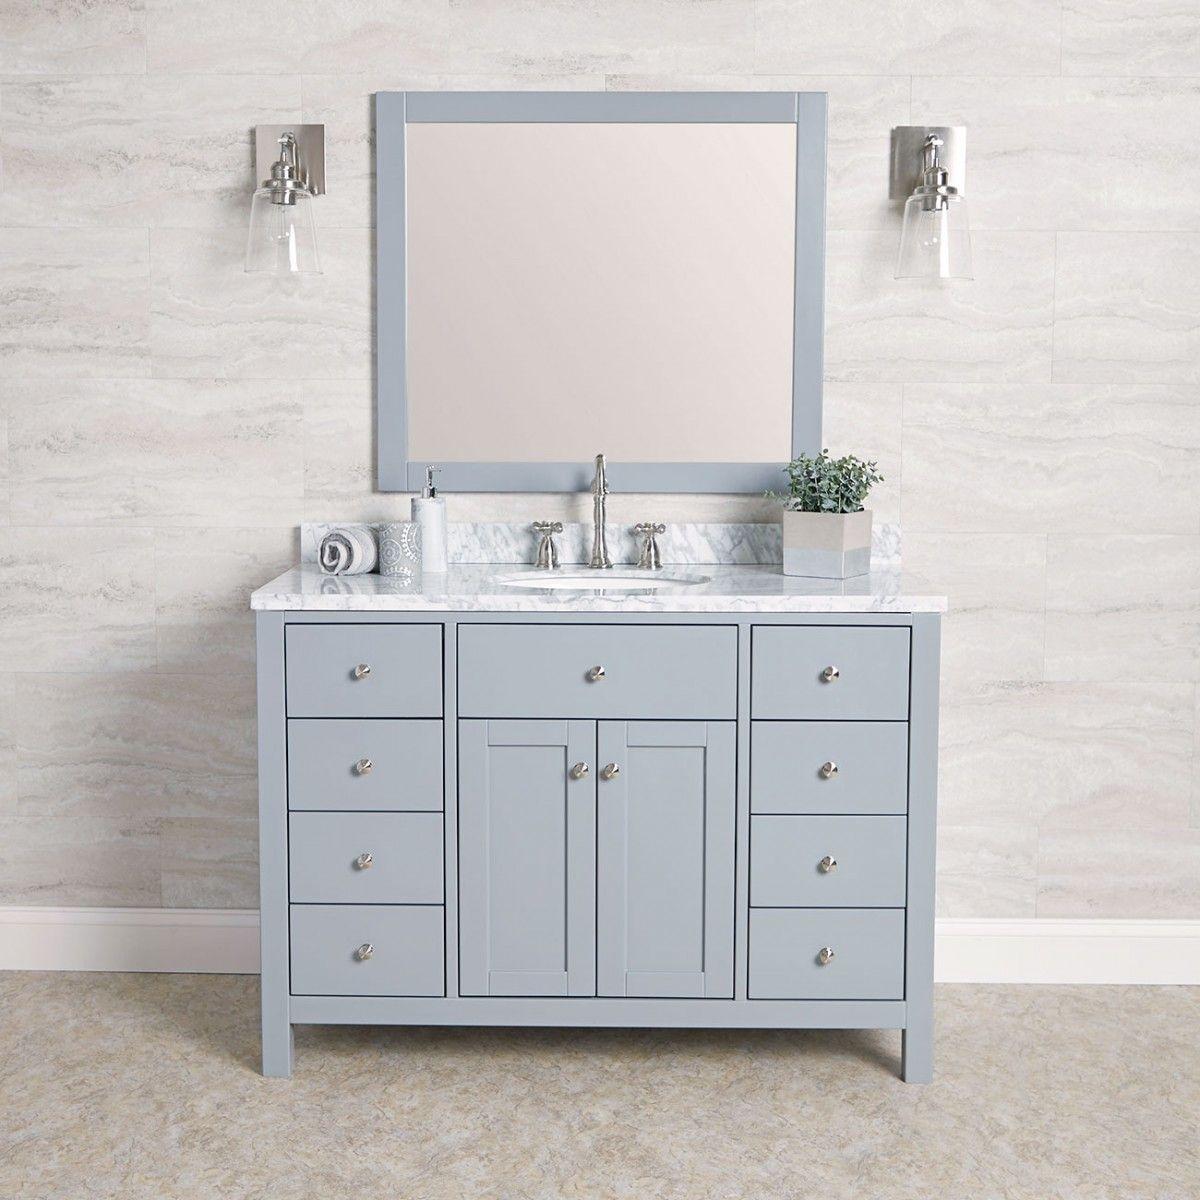 This Just In New Randolph Morris Bathroom Vanities The Hampton